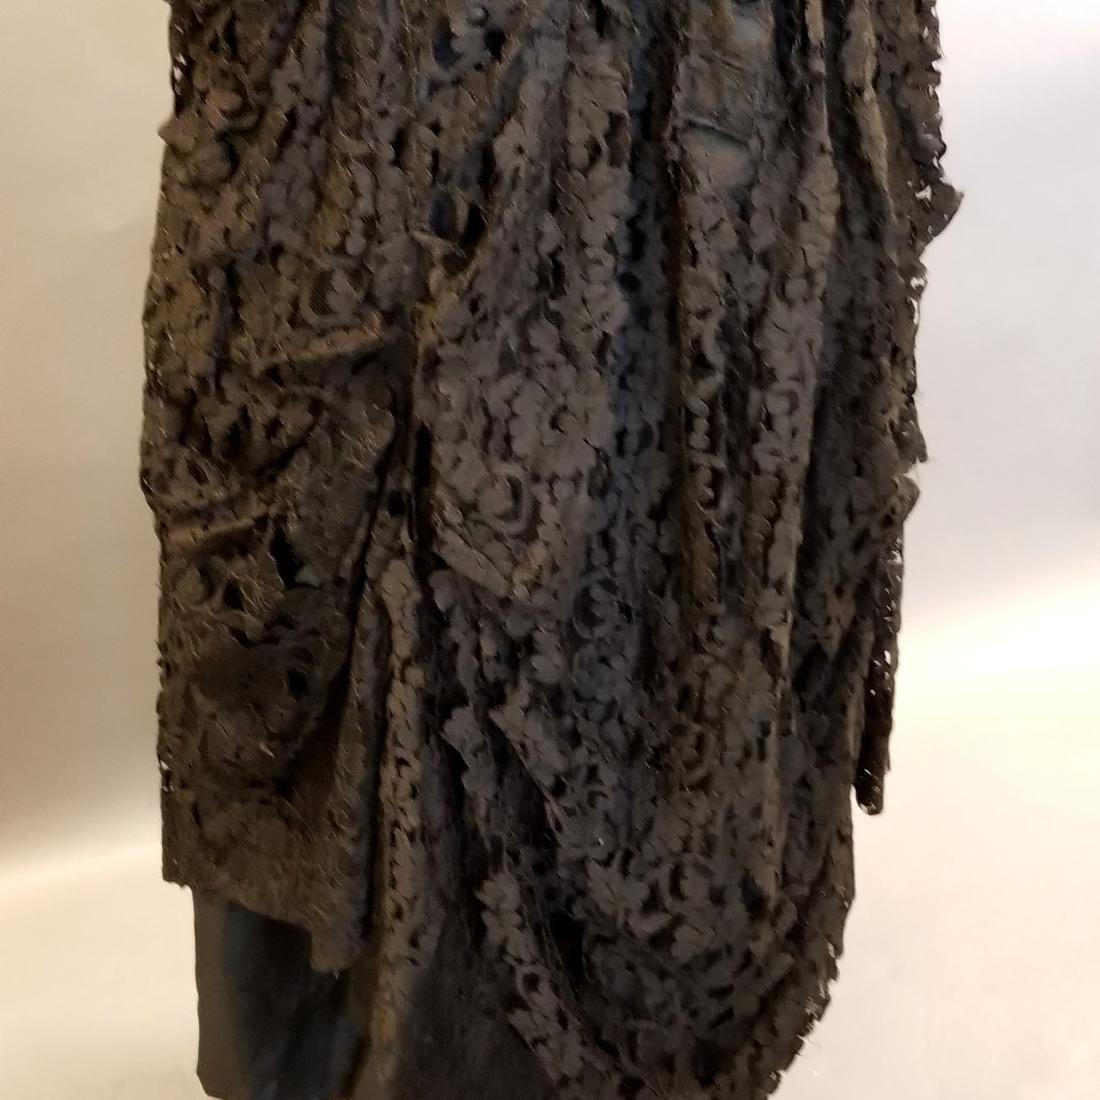 Black Lace Reception Dress - 3